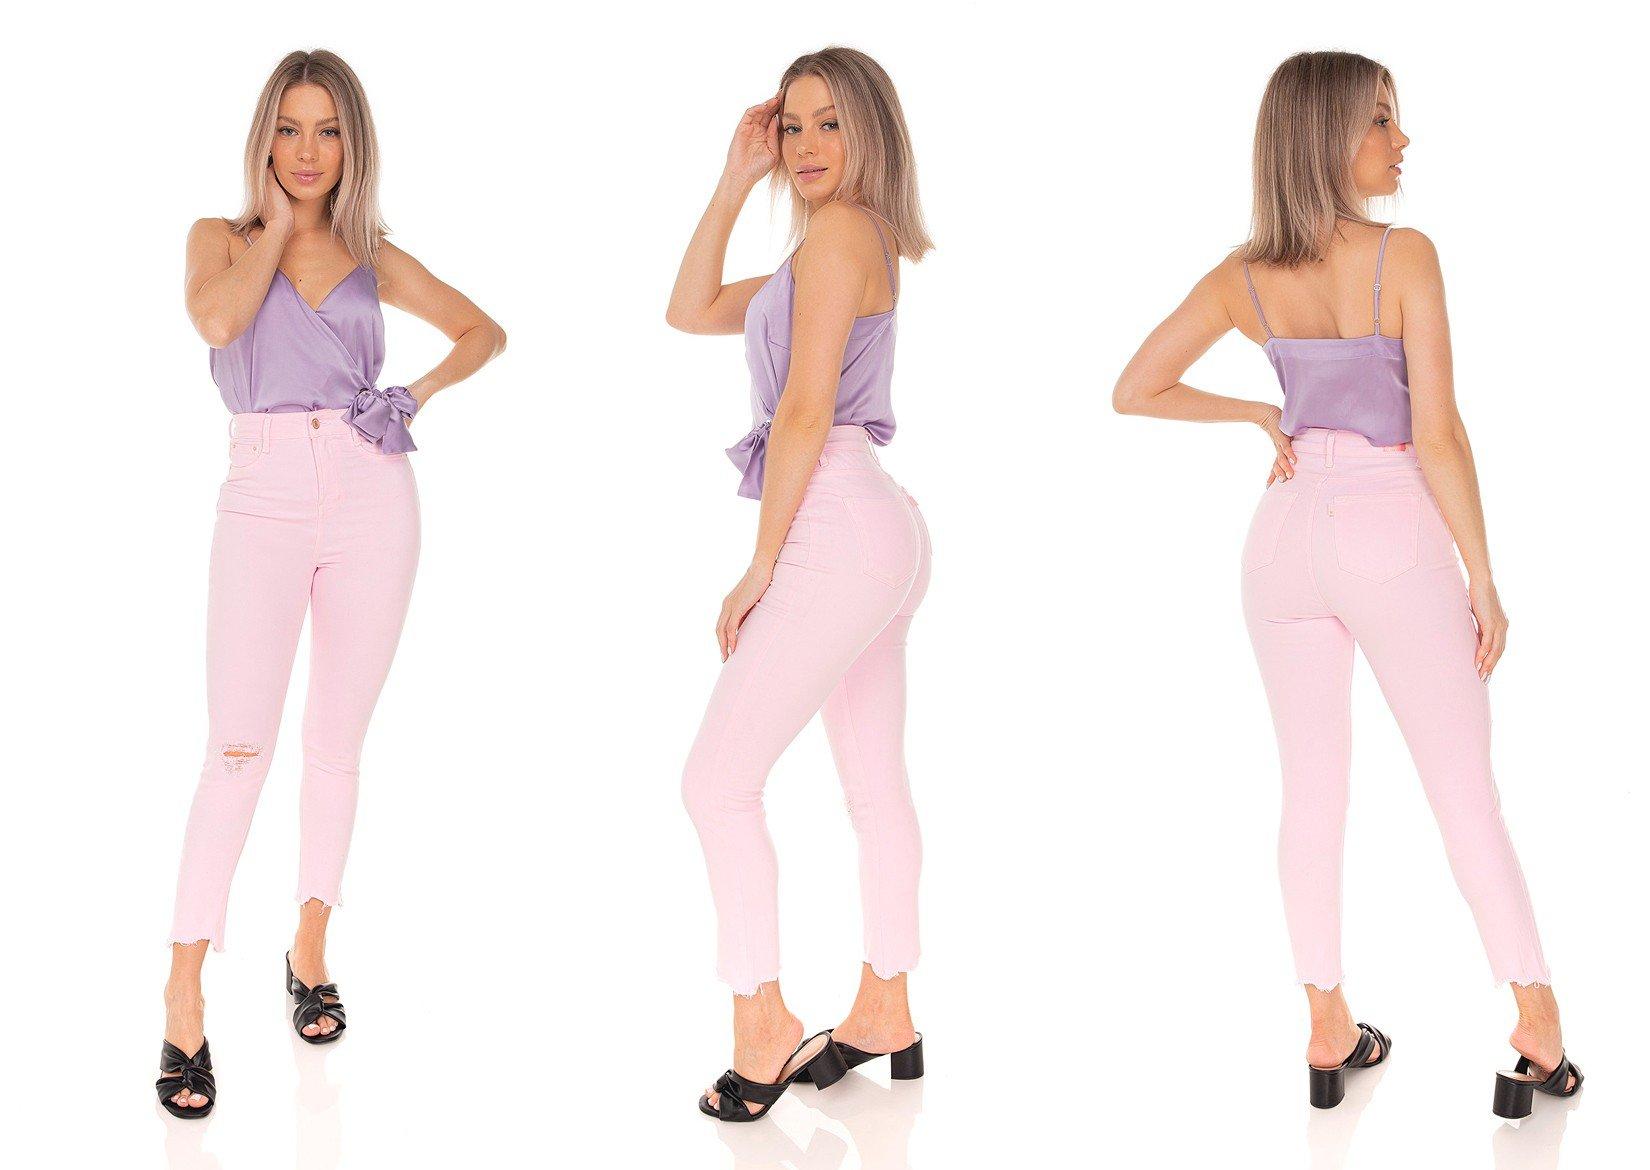 dz3521 calca jeans feminina skinny hot pants cropped colorida rosa clarinho denim zero tripla